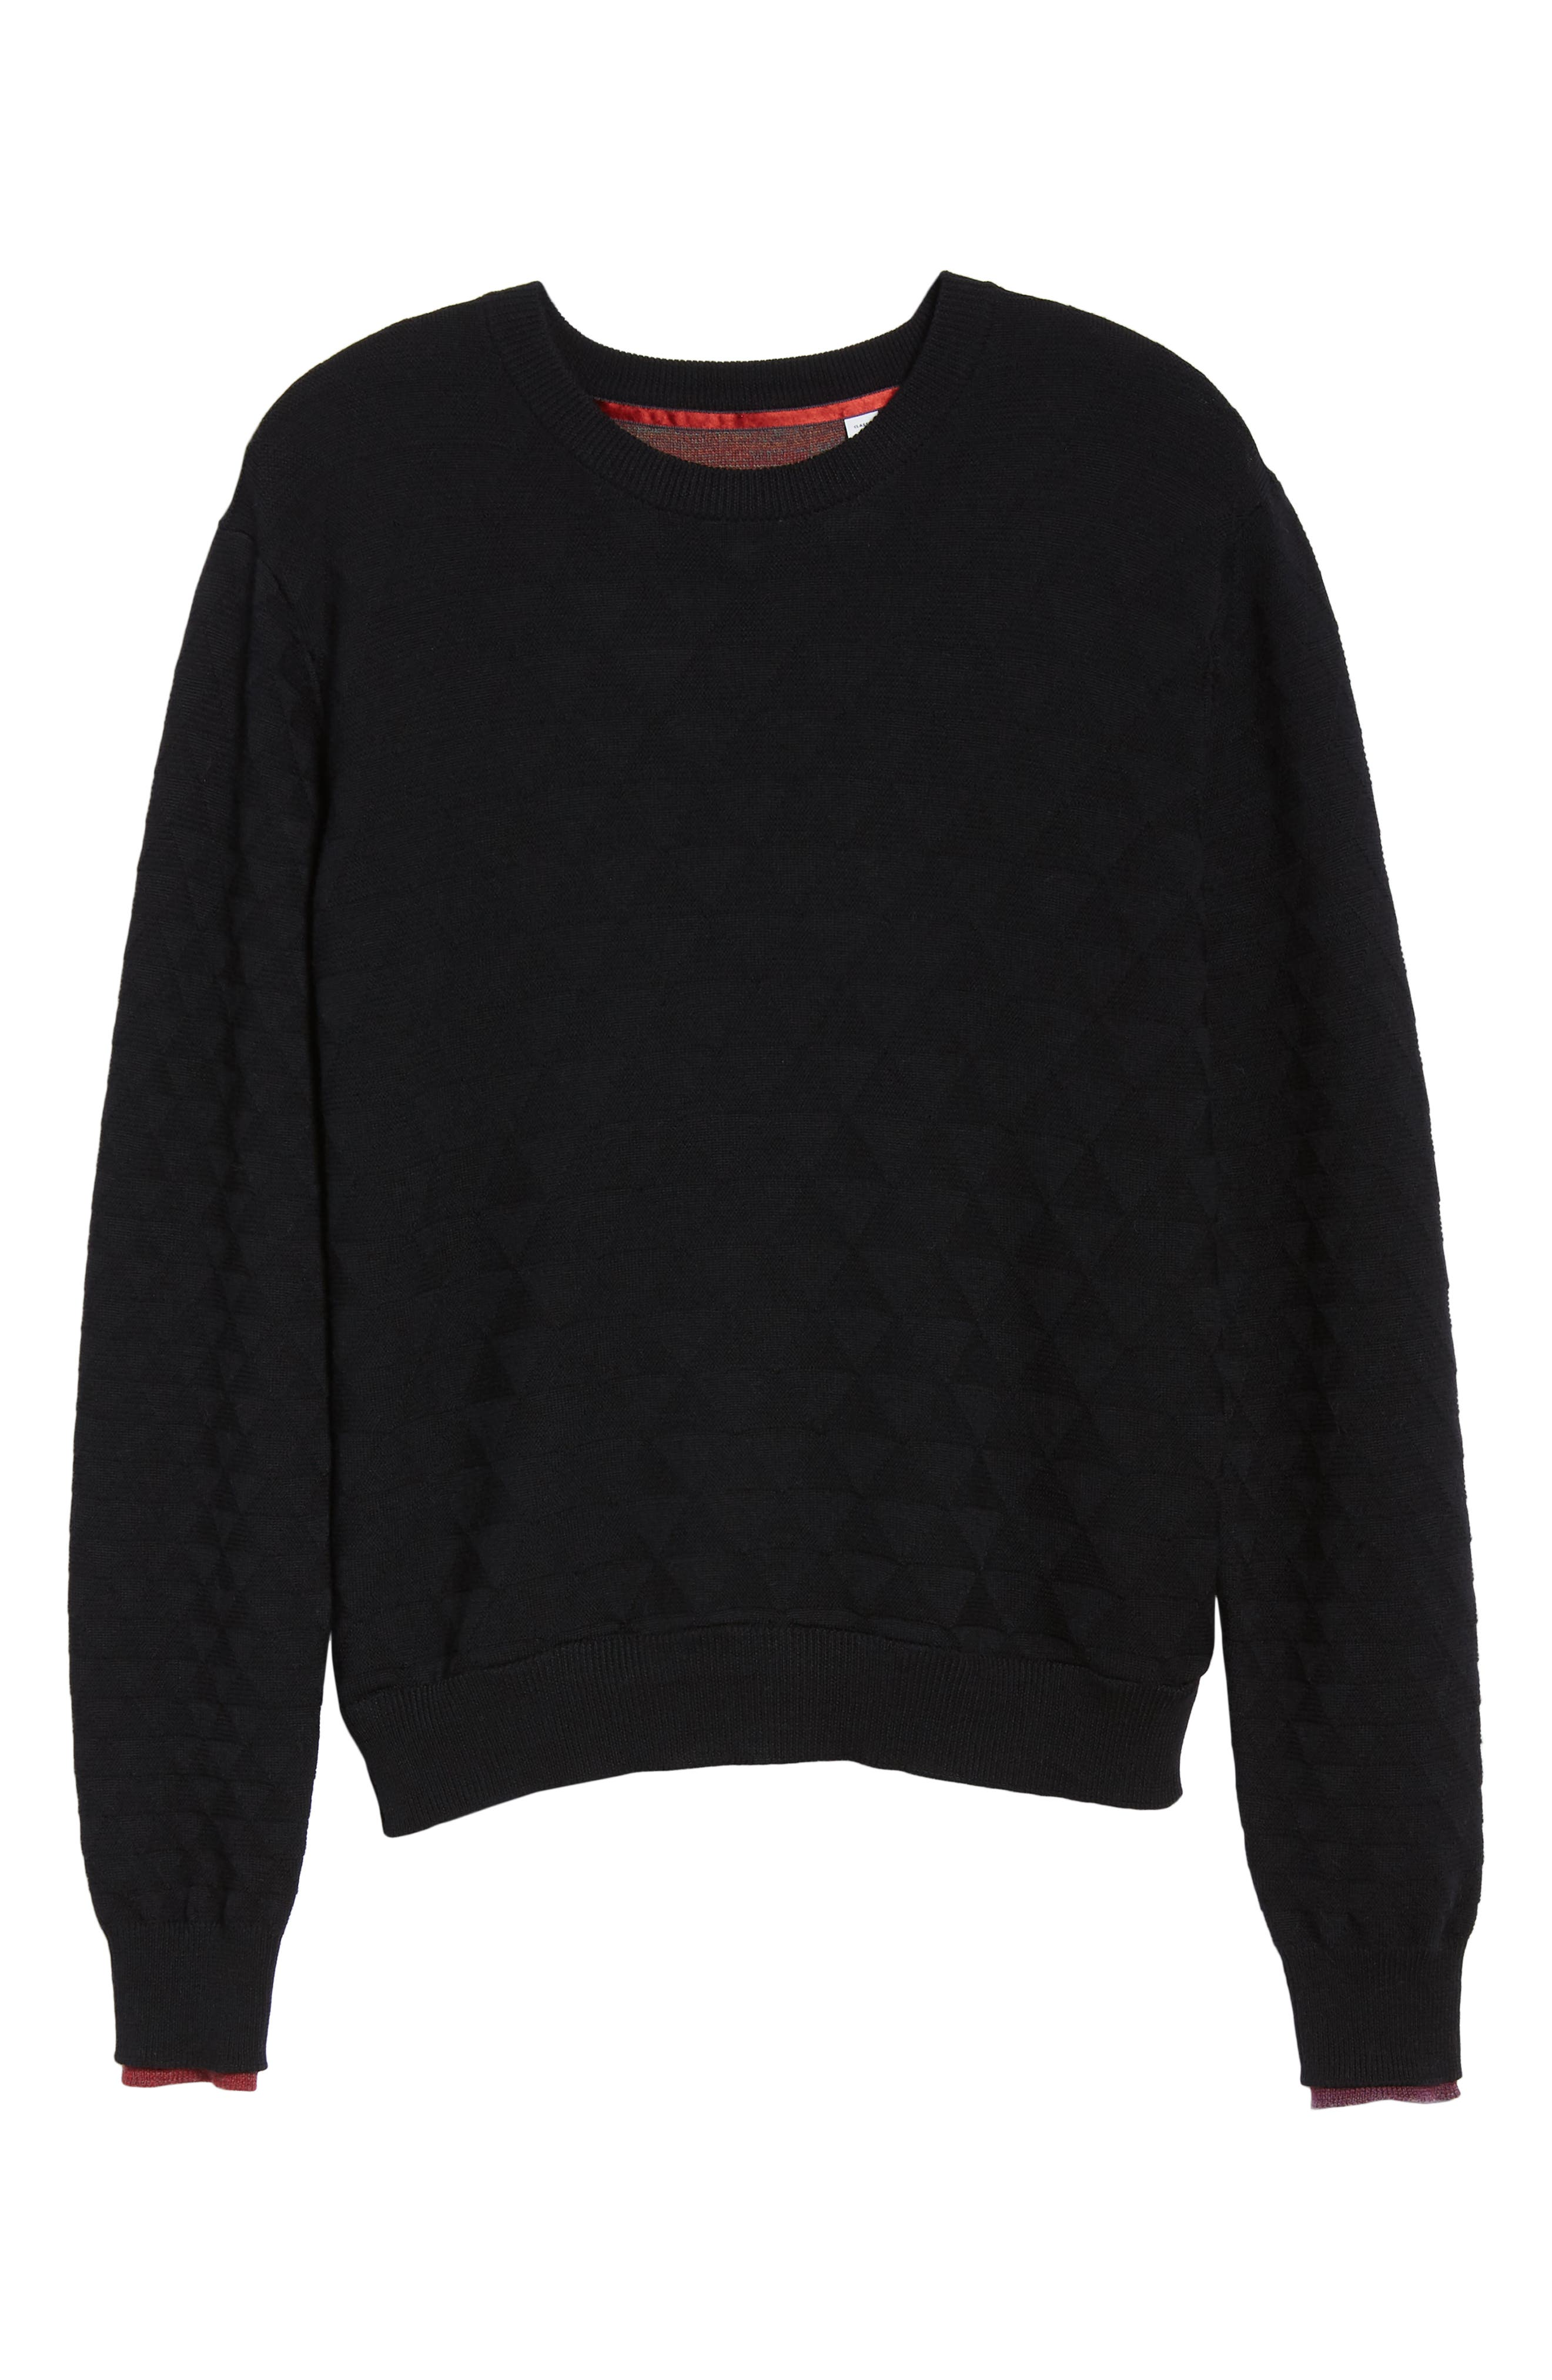 Blackburn Classic Fit Sweater,                             Alternate thumbnail 6, color,                             BLACK